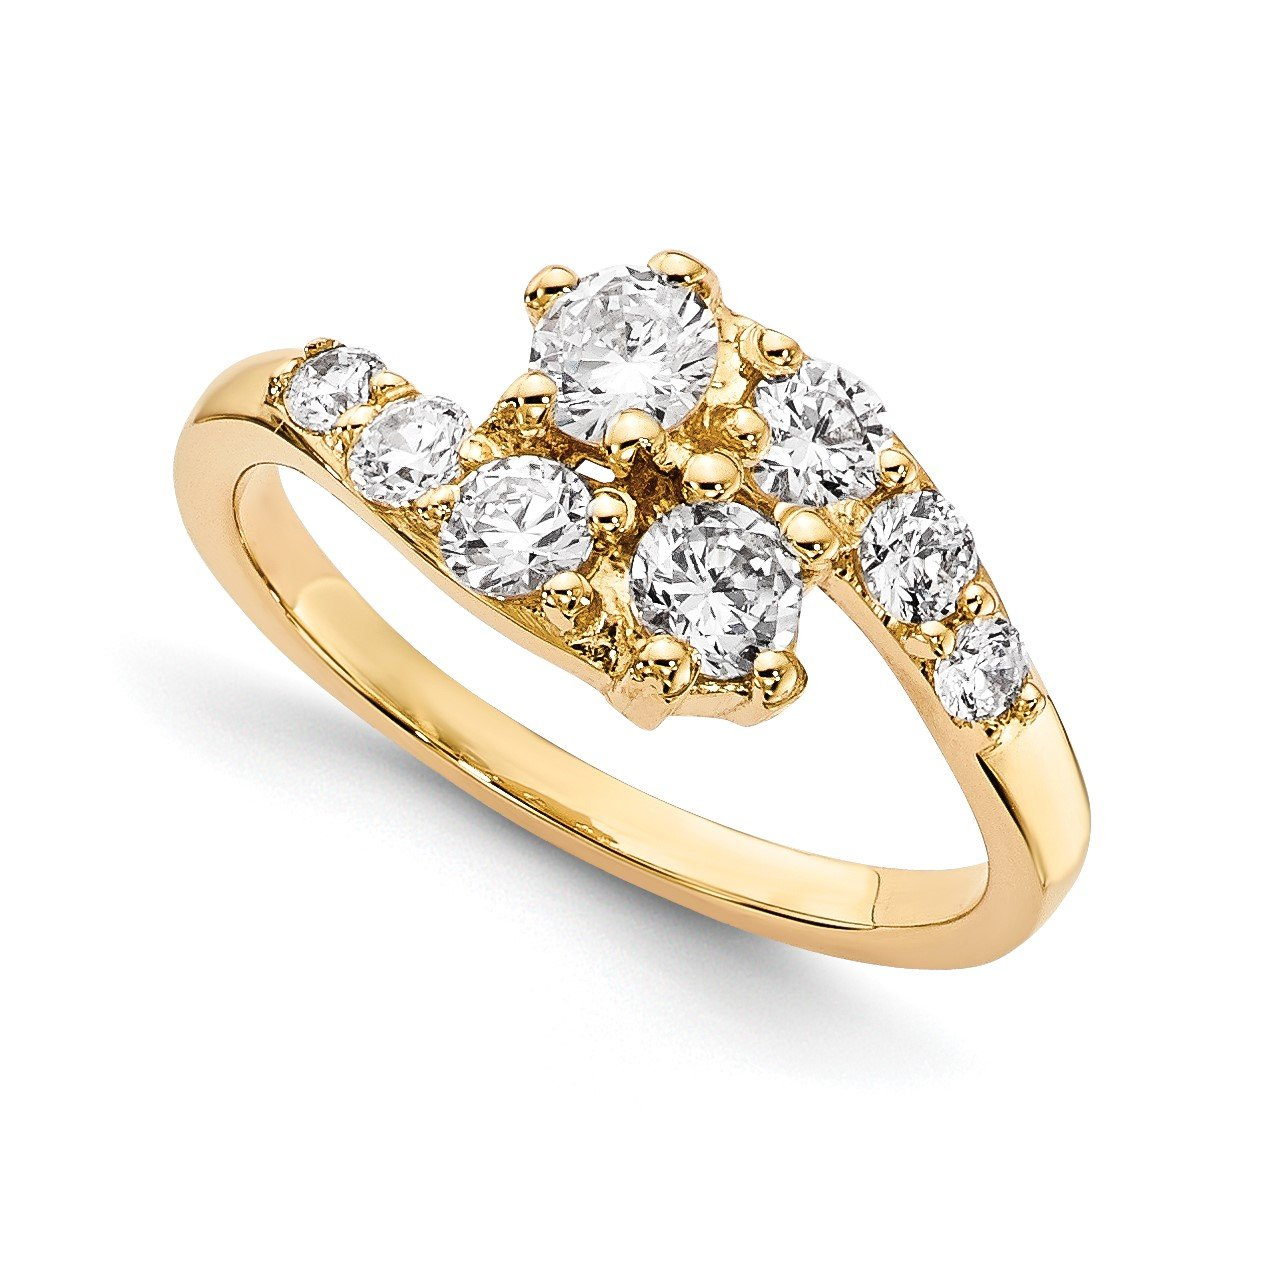 14KY A Diamond 2-stone Ring Semi-Mount - 2.8 mm center stones